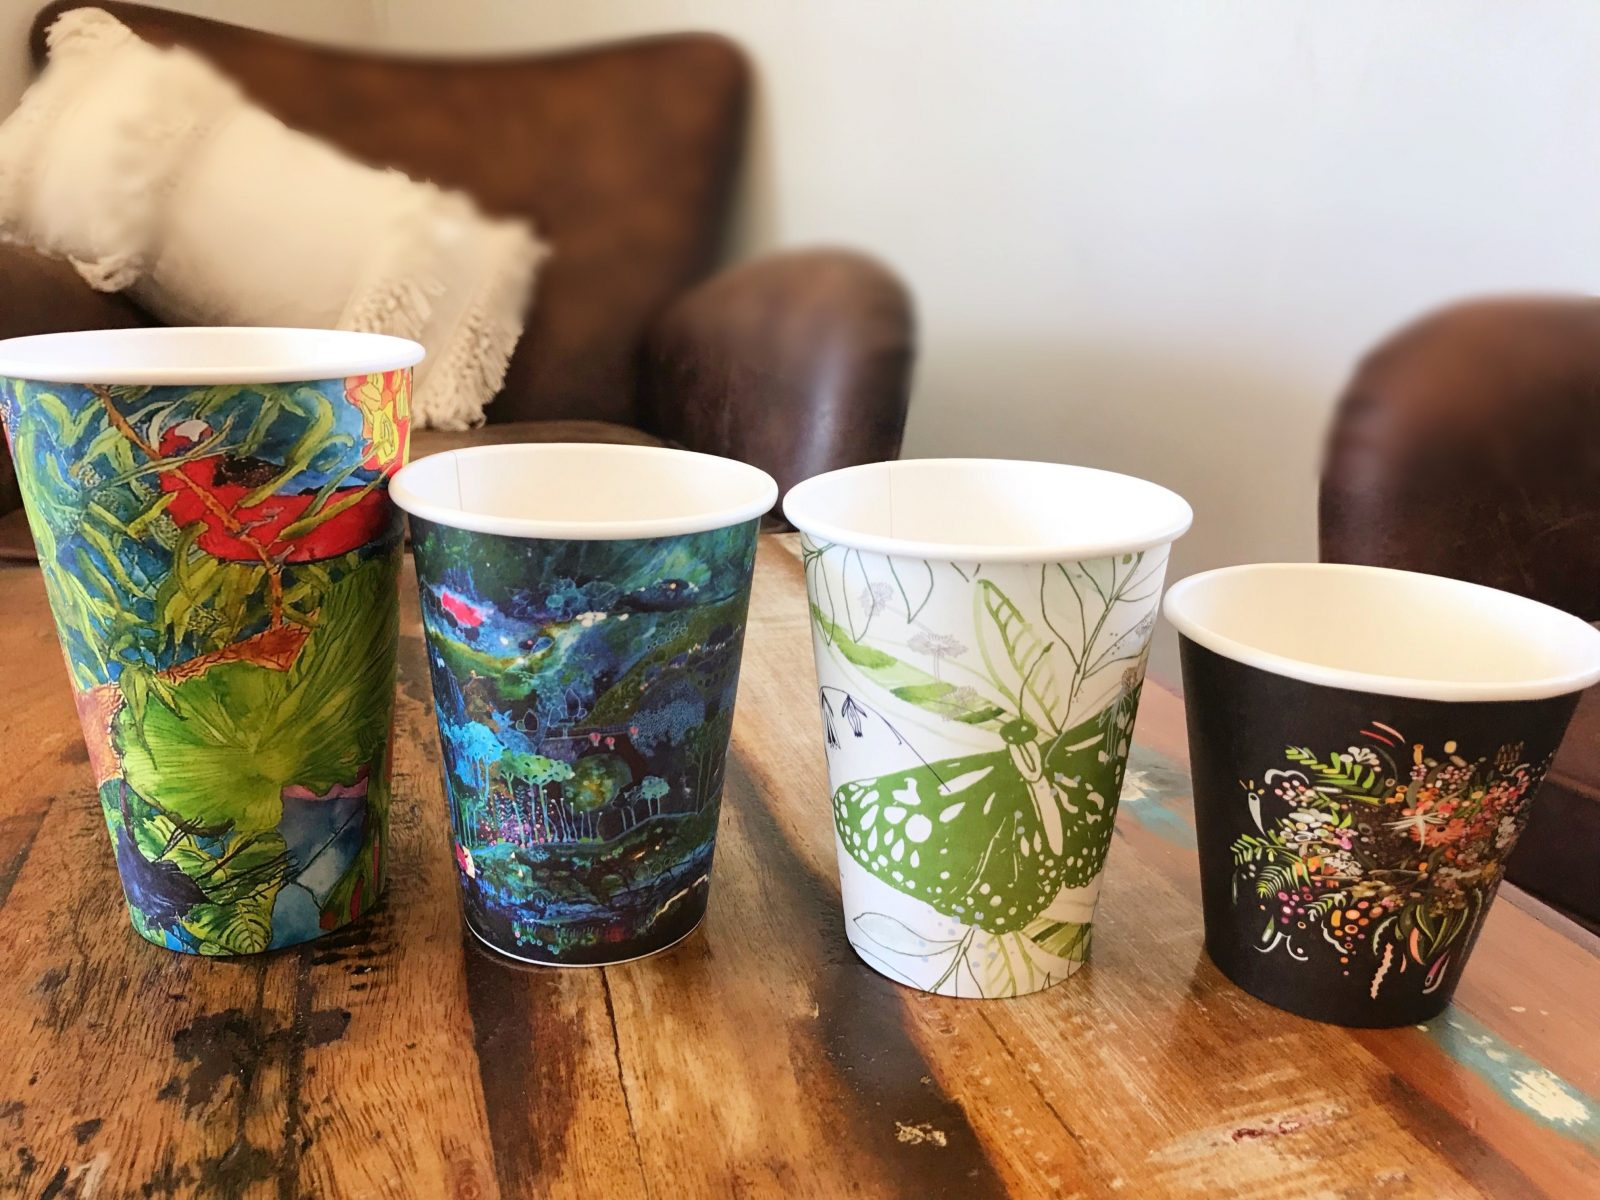 Bio cups used onsite